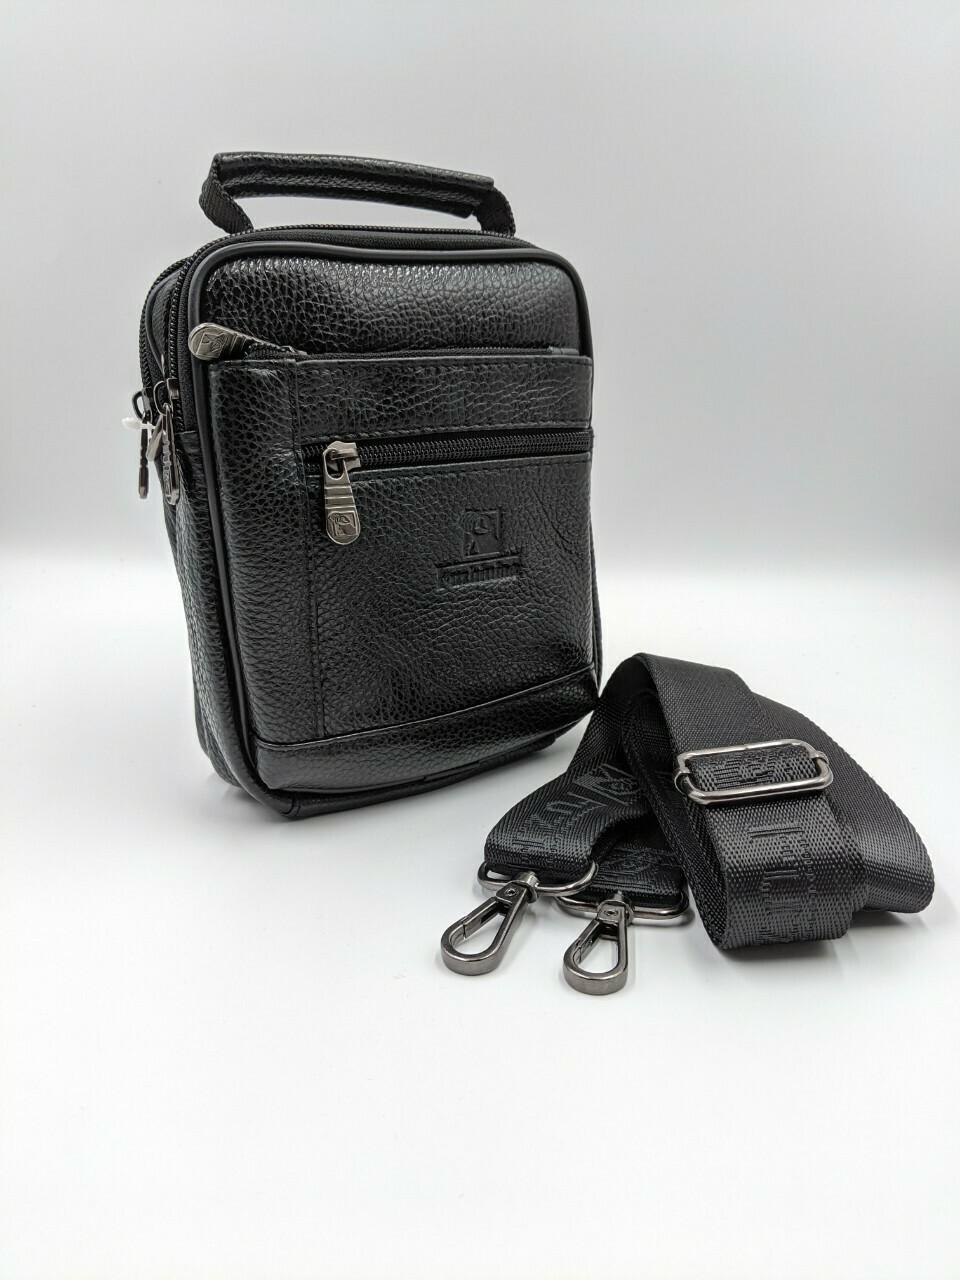 Мужская кожаная сумка zznick 5286